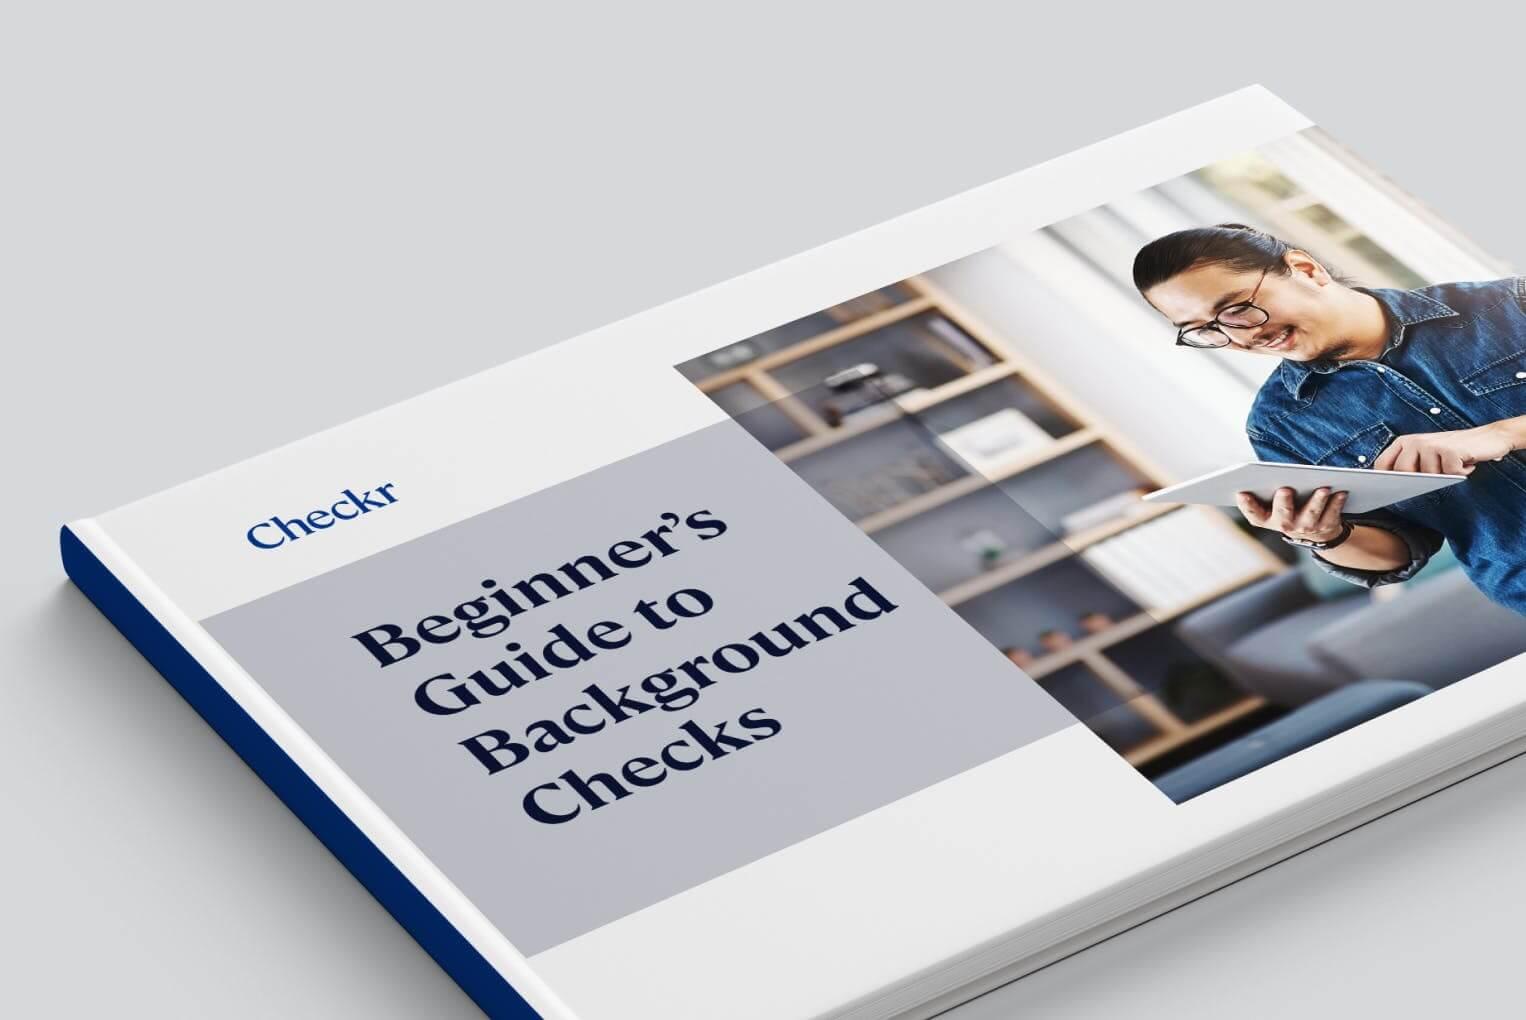 Beginners Guide Asset Image